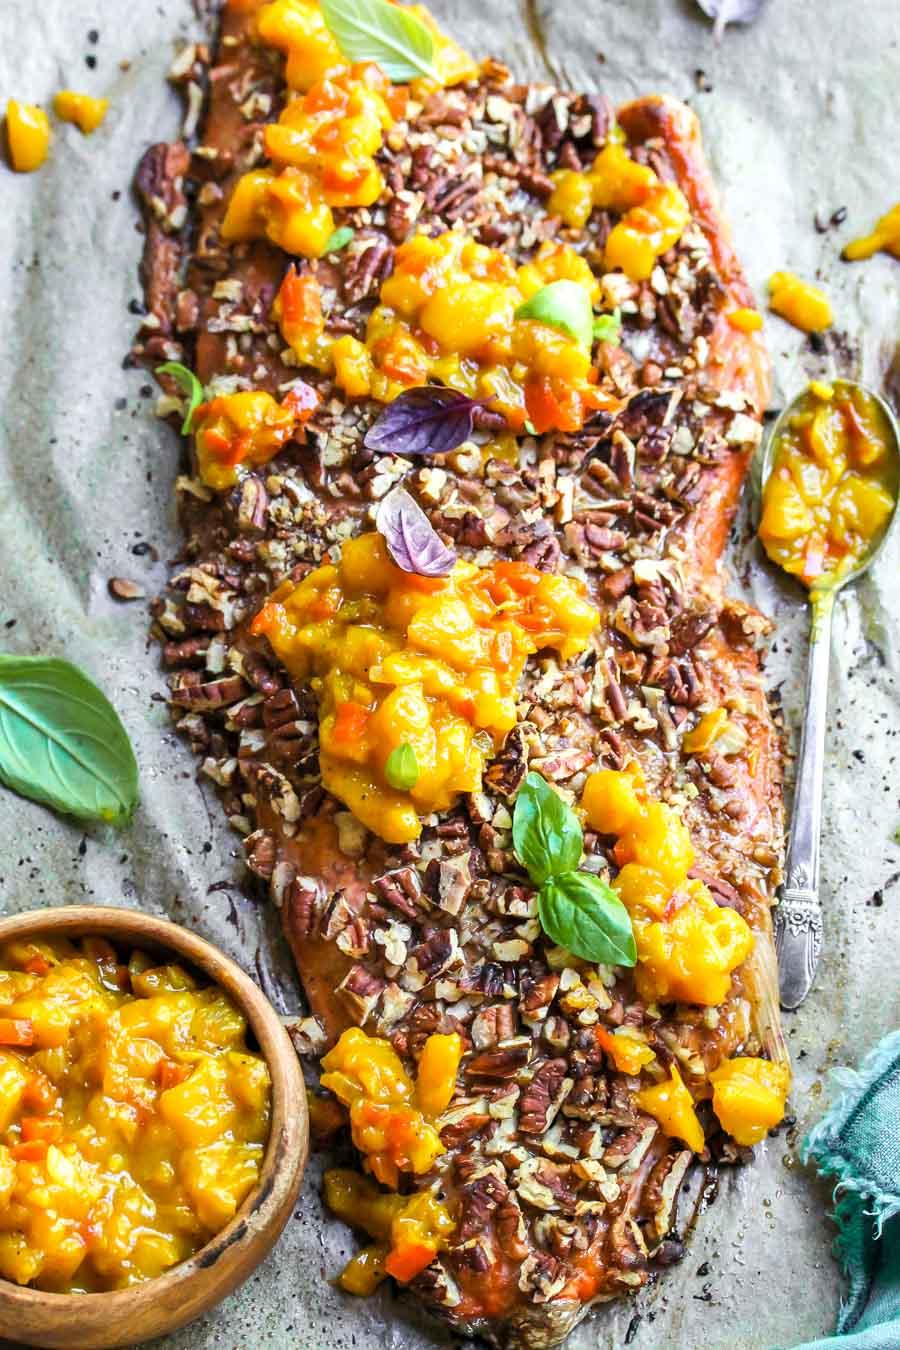 Roasted Salmon with Pecans and Mango Chutney